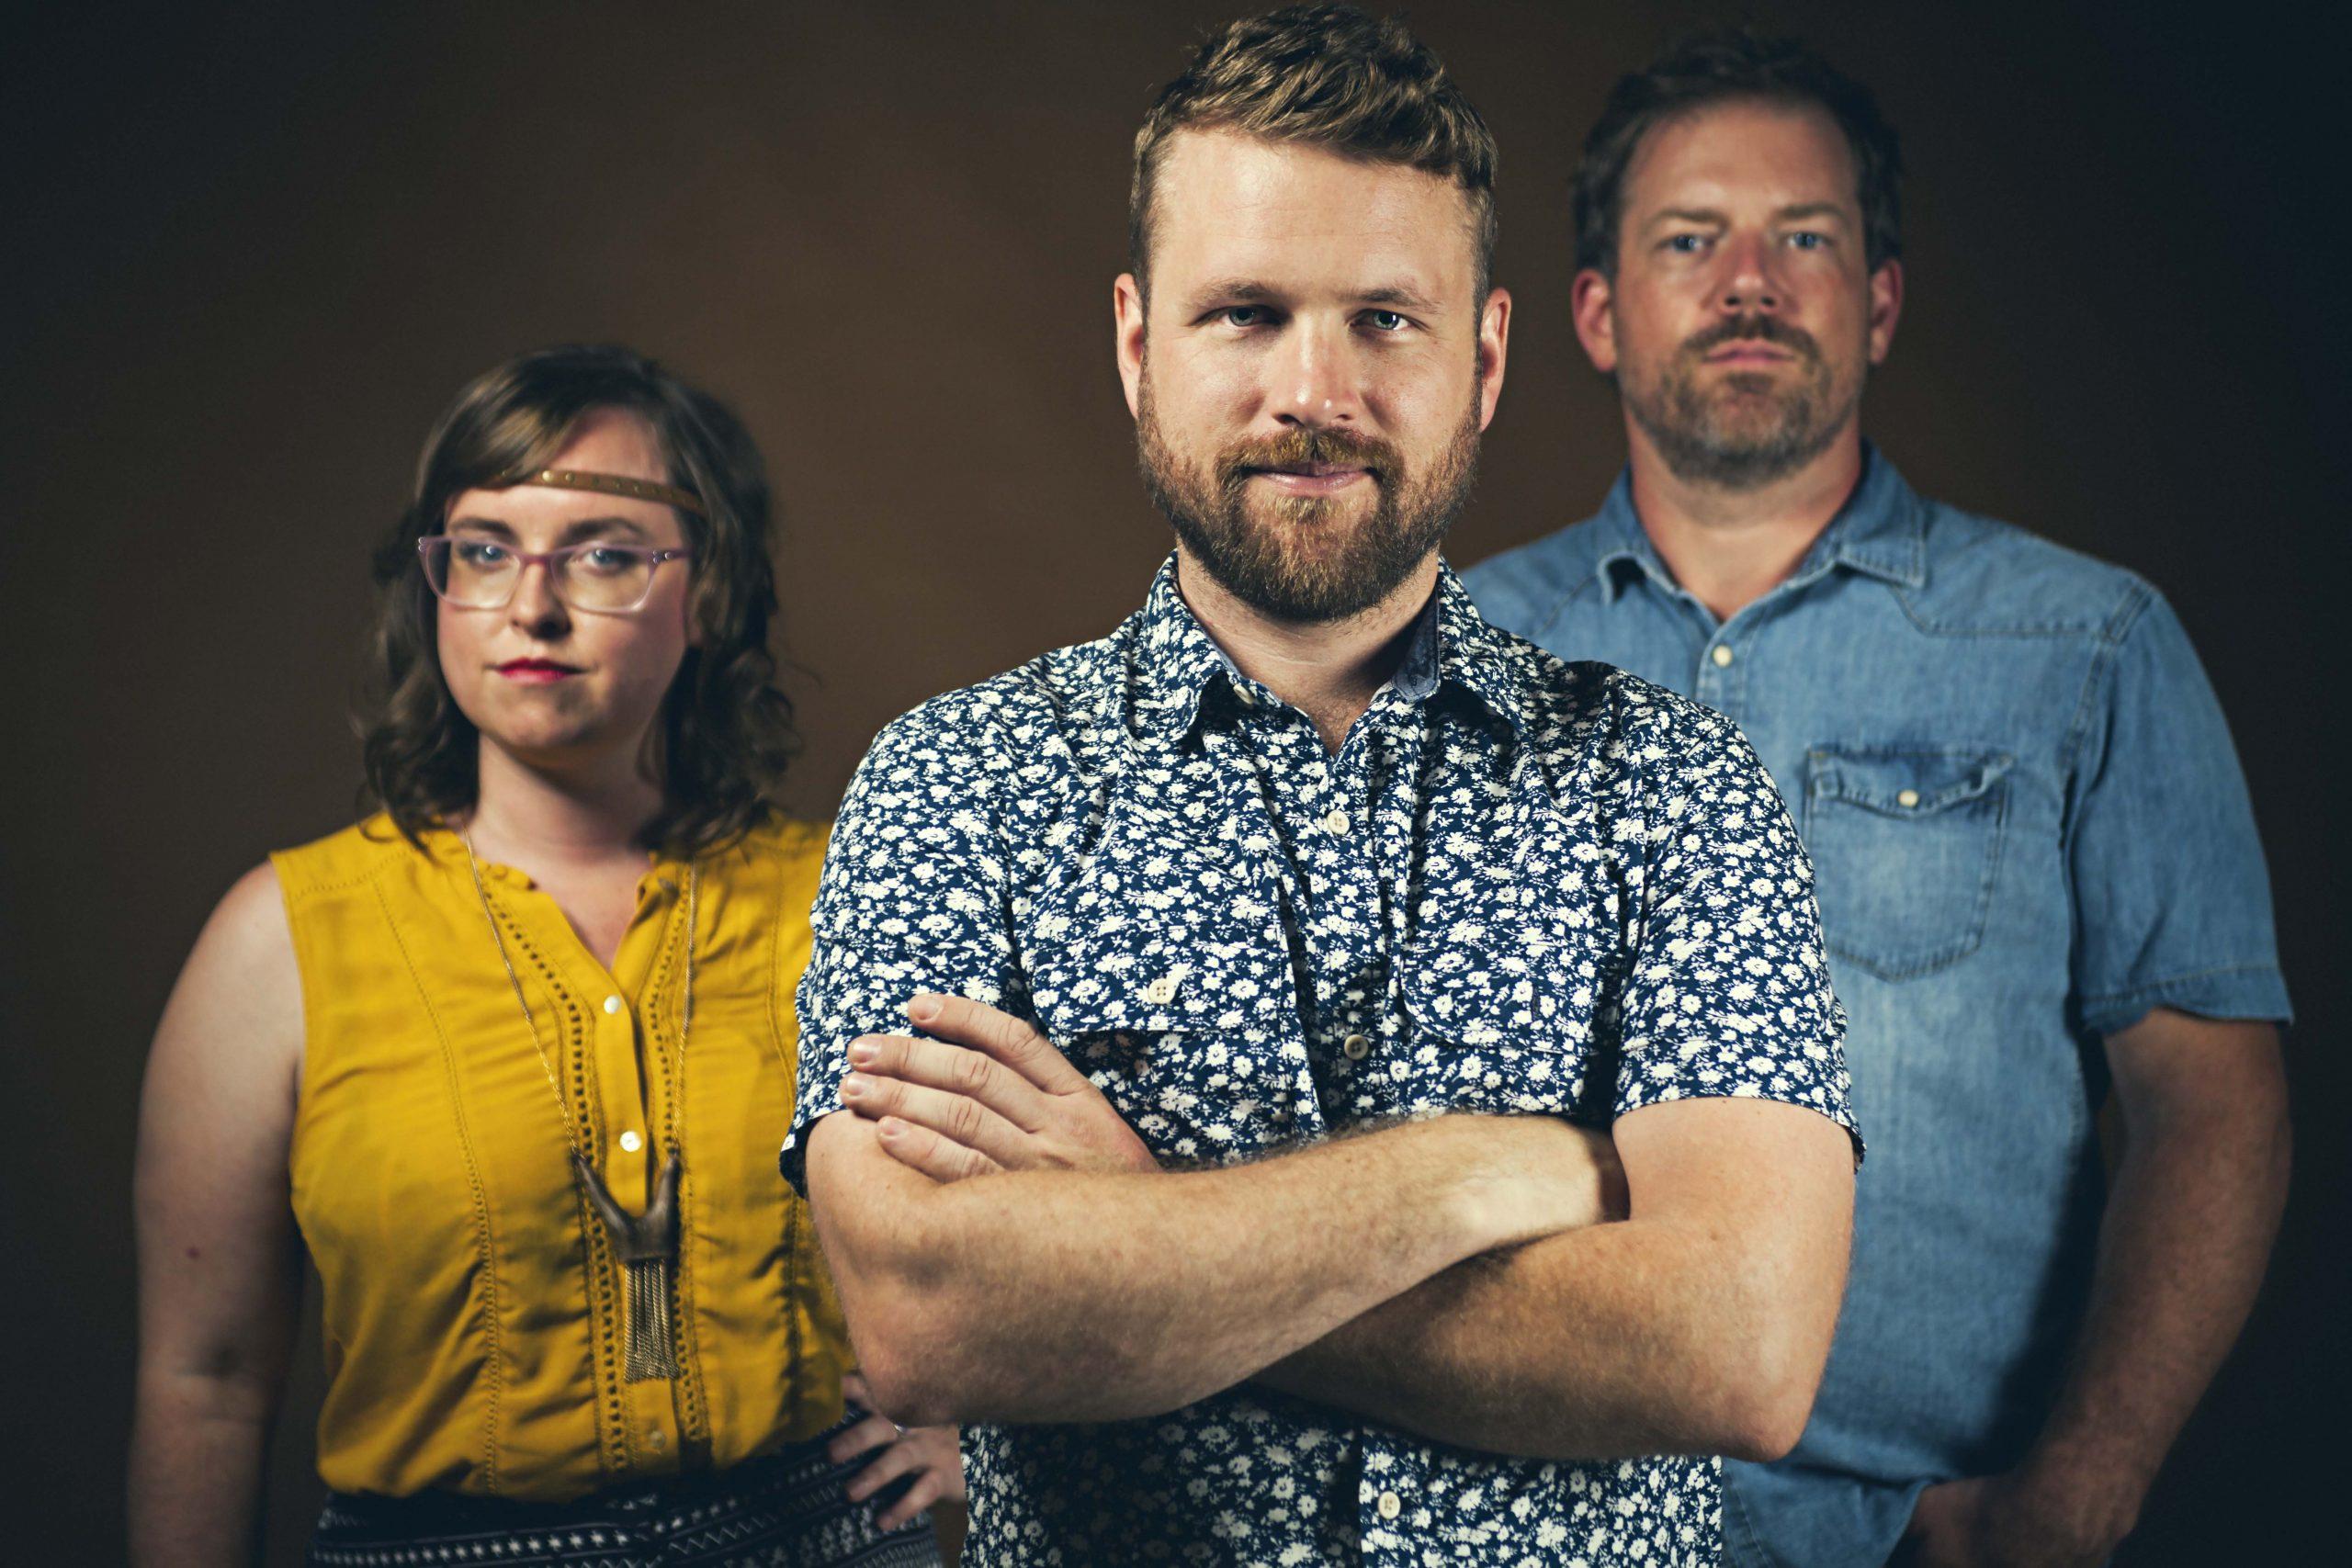 WATCH: Jon Stickley Trio, 'Point to Point'